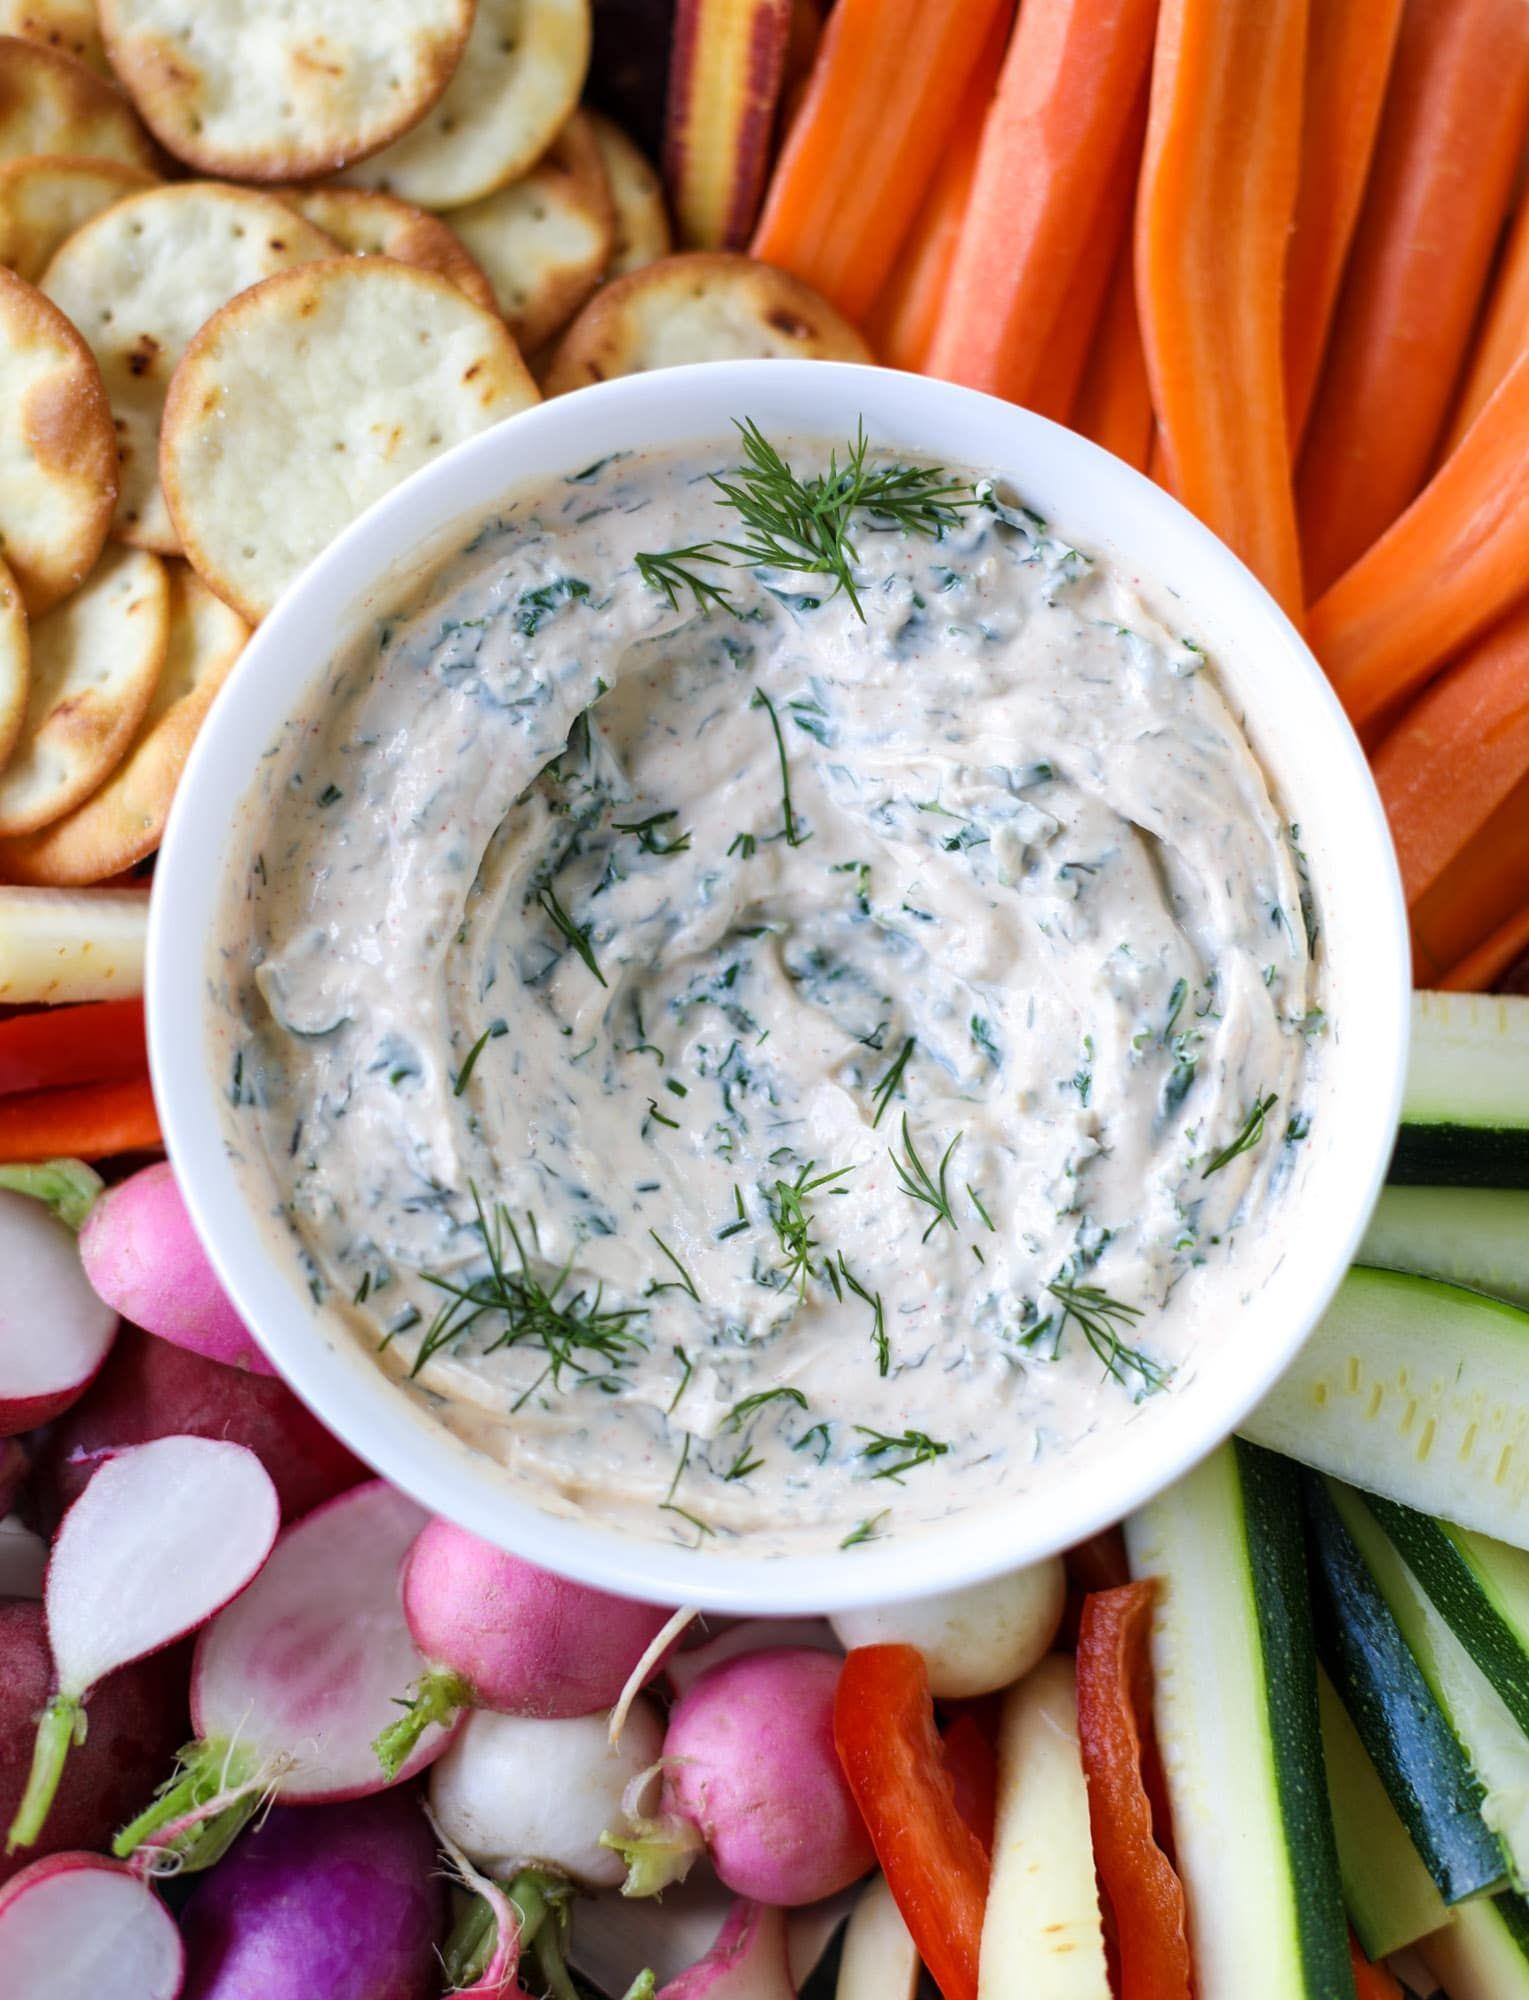 Greek yogurt ranch dip kale cool ranch dip recipe